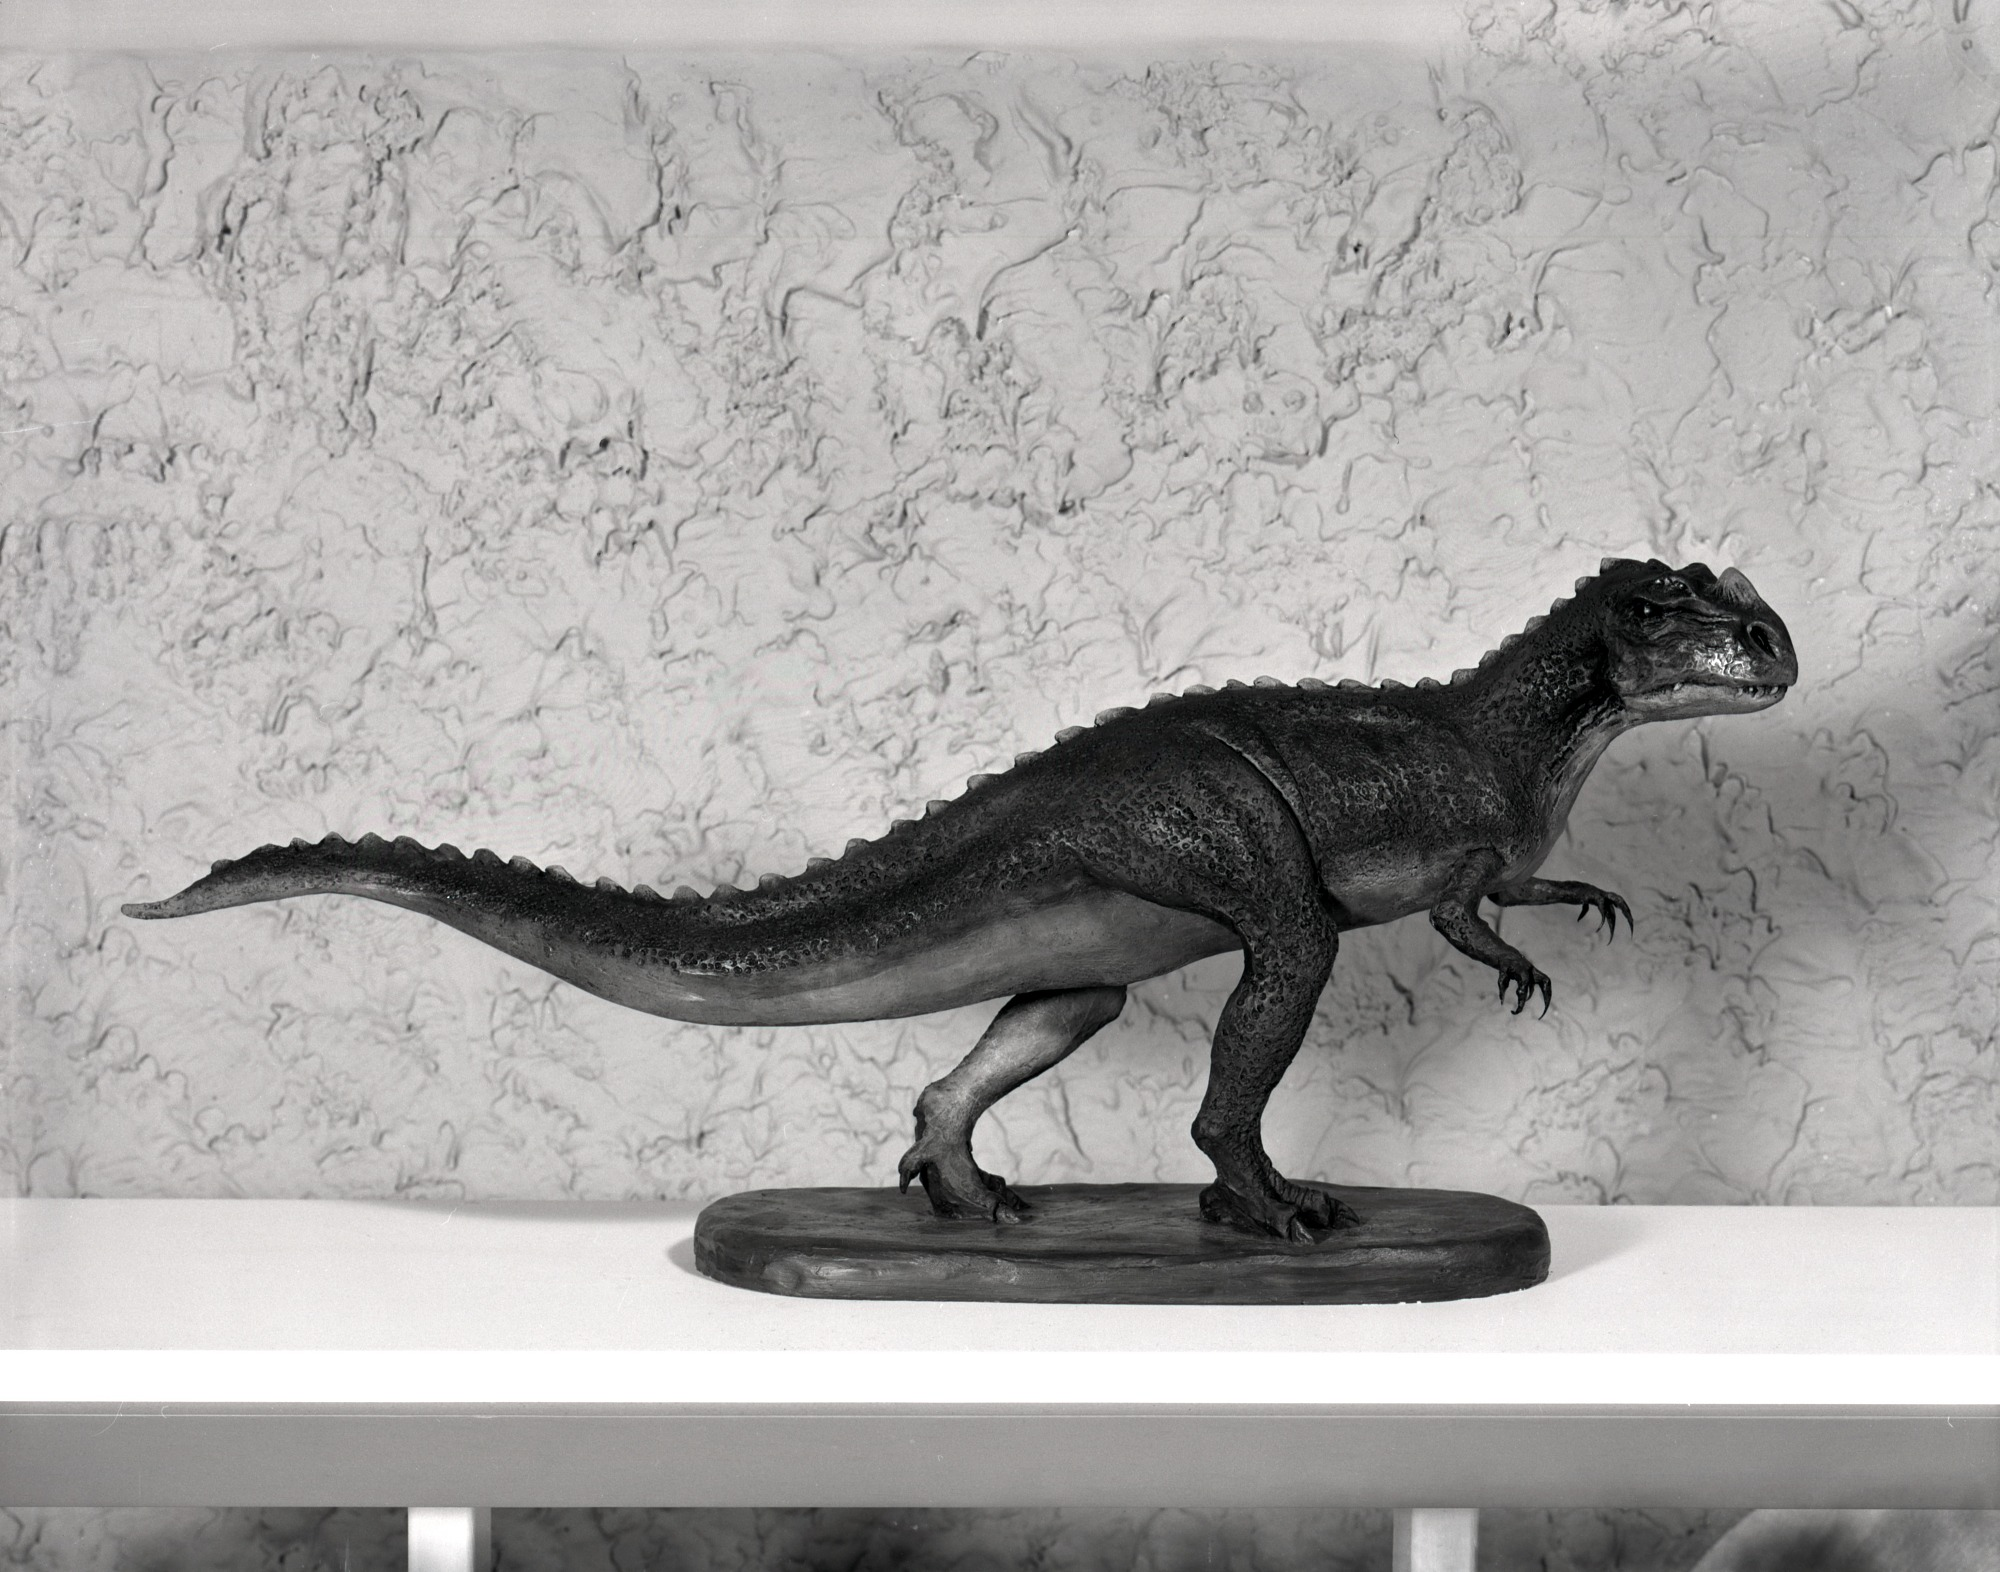 Ceratosaurus Nasicornis Model, 1965, Smithsonian Institution Archives, SIA Acc. 16-126 [MNH-1367].